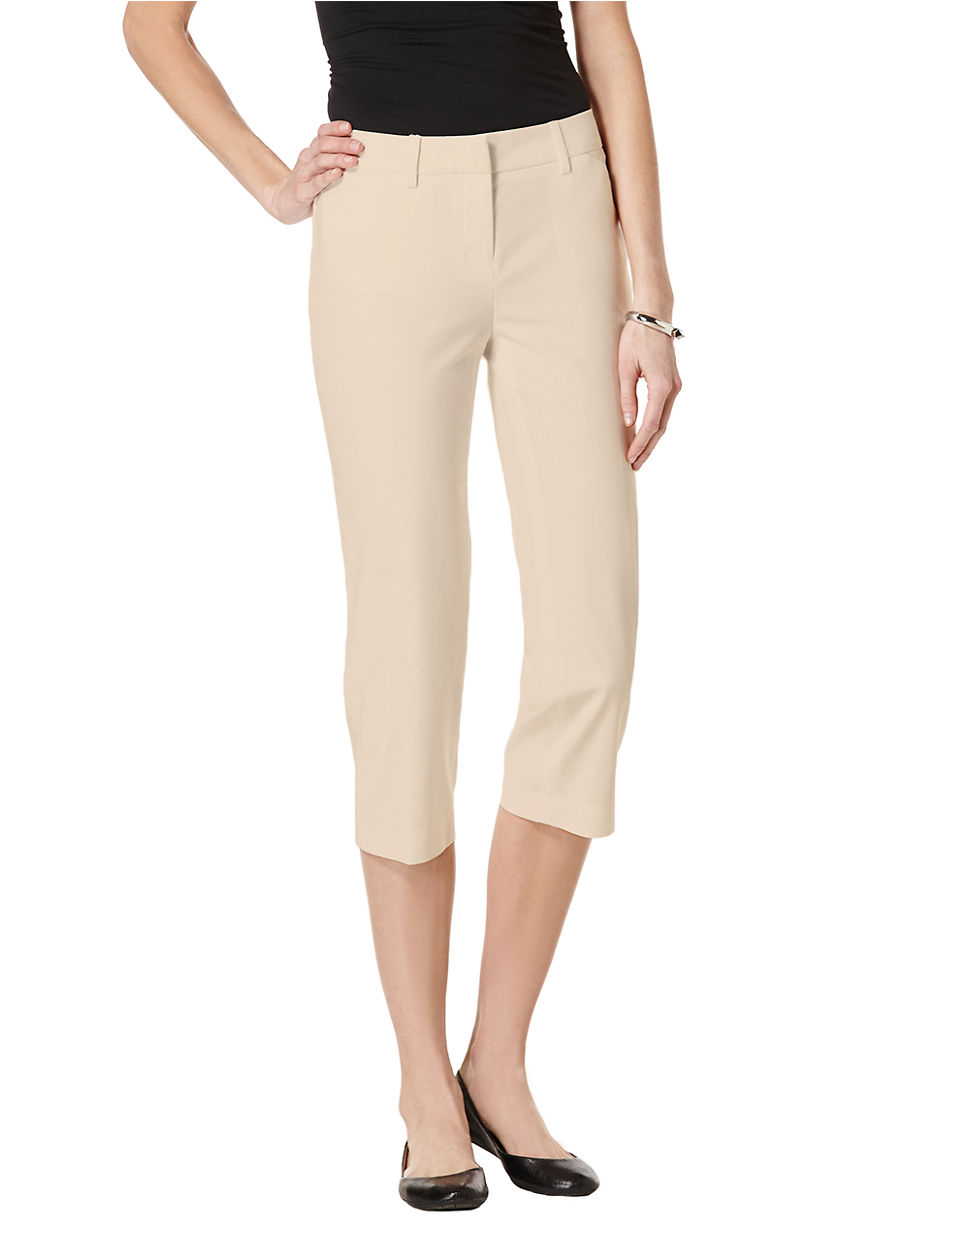 Rafaella Petite Solid Double Weave Curvy Capri Pants in Natural | Lyst